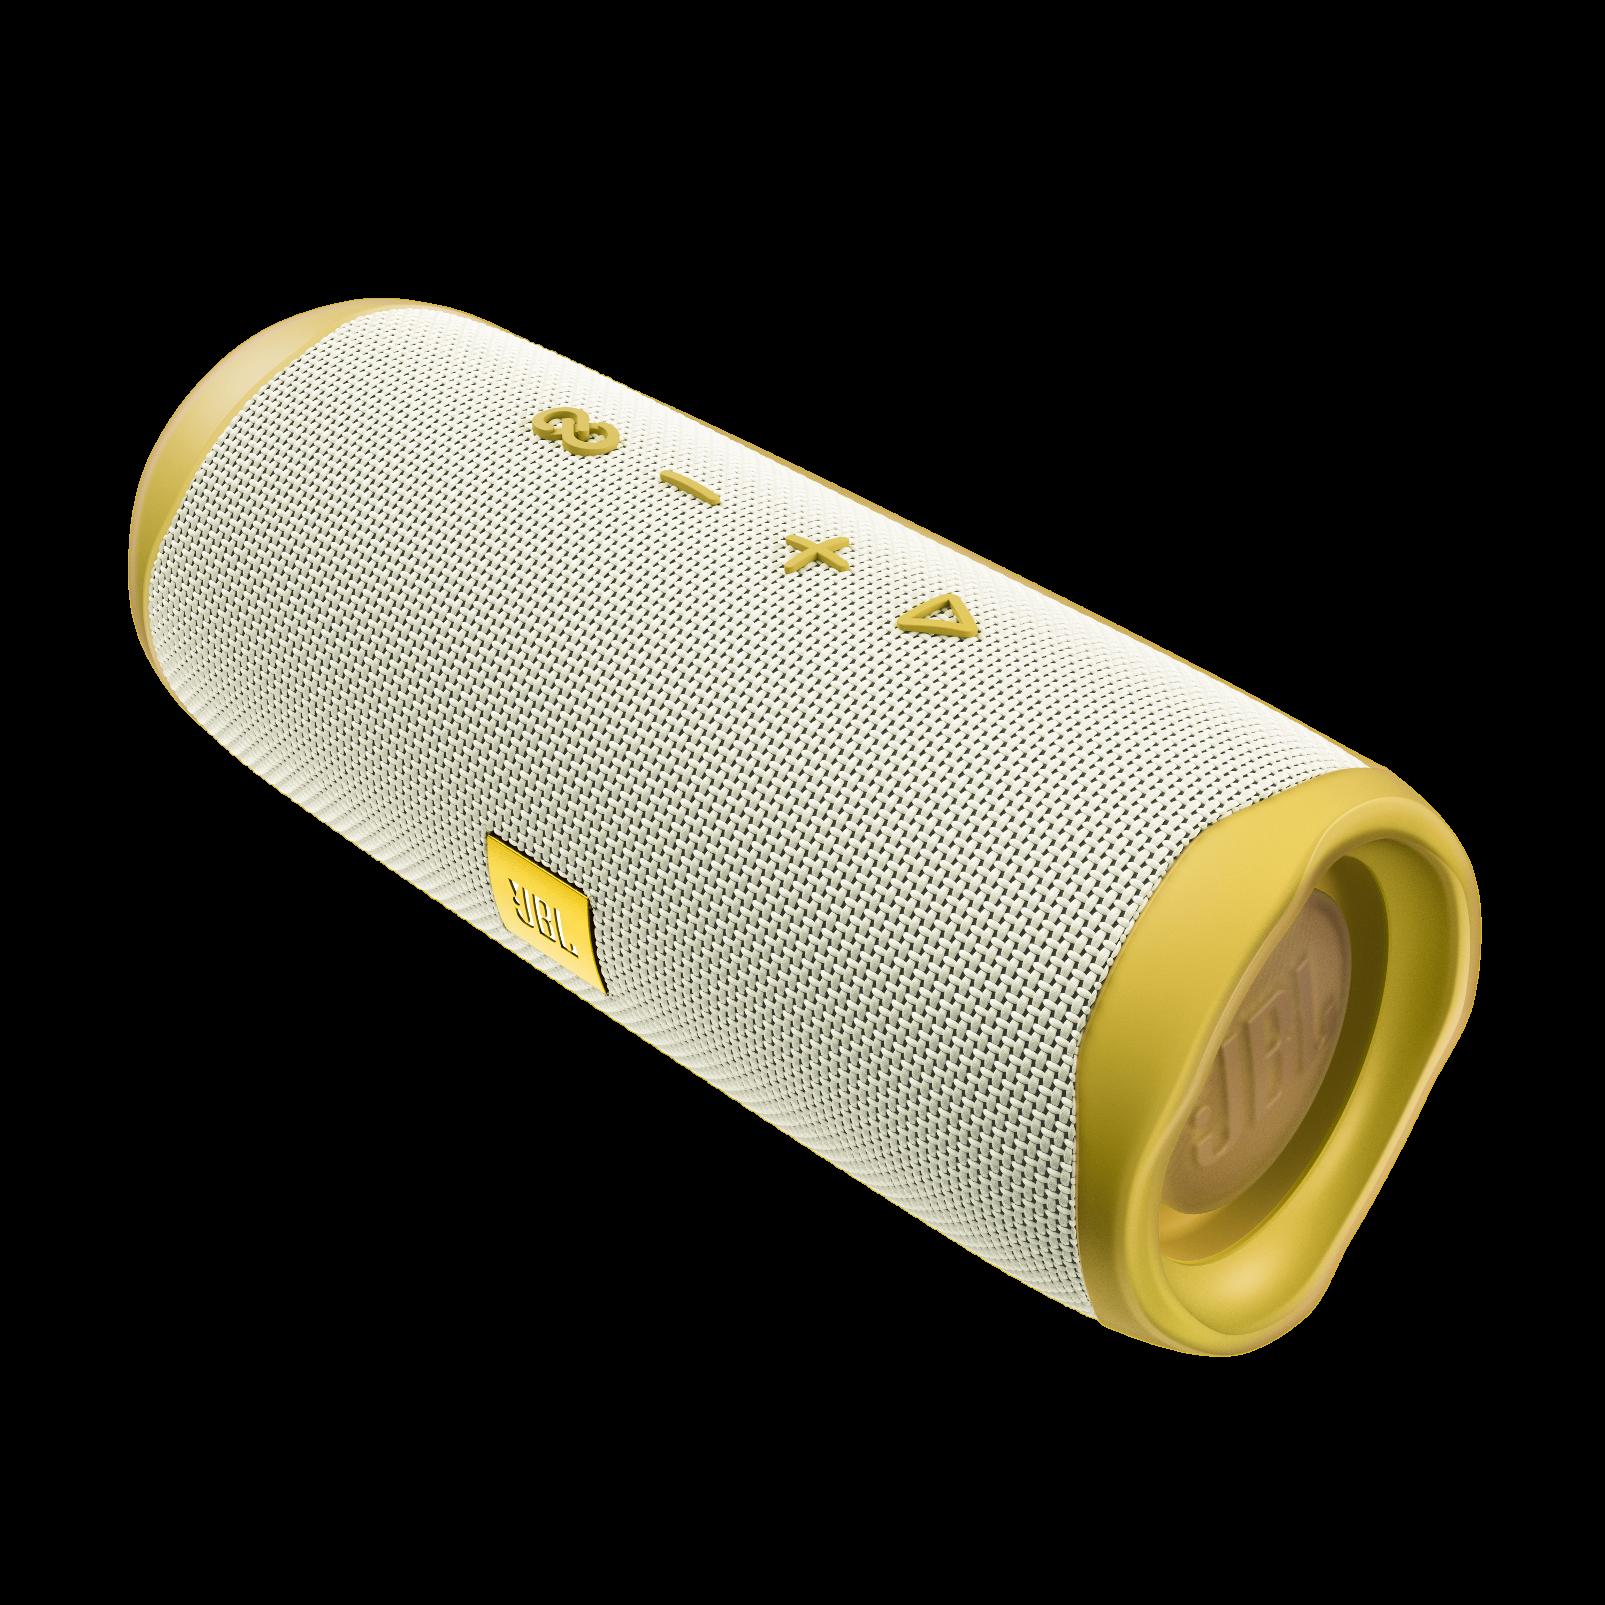 JBL Flip 5 Tomorrowland Edition - Gold/White - Portable Waterproof Speaker - Left